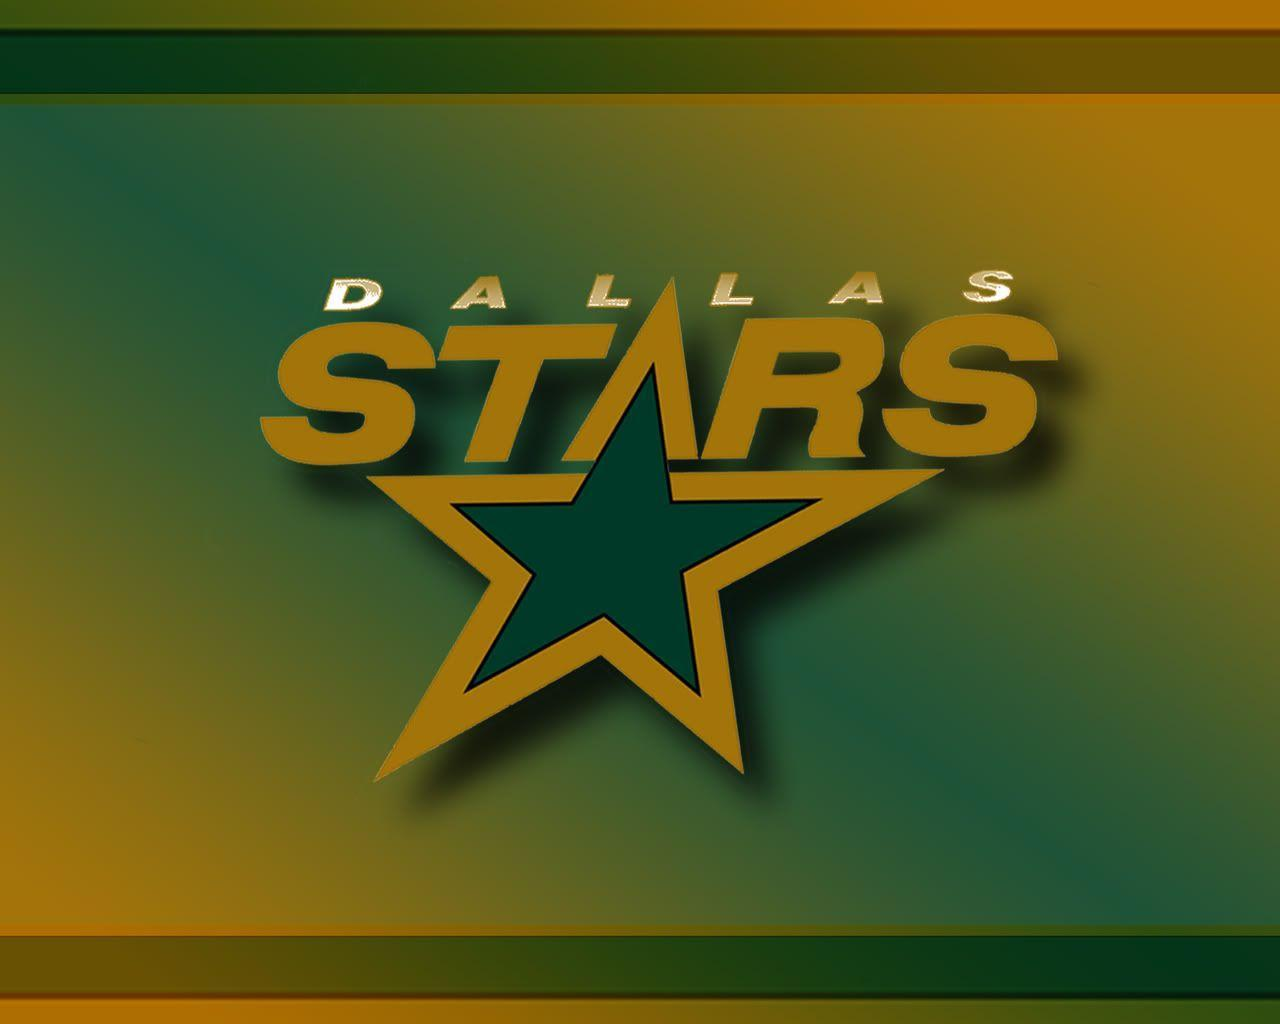 Dallas Stars wallpaper | 1280x1024 | #69299